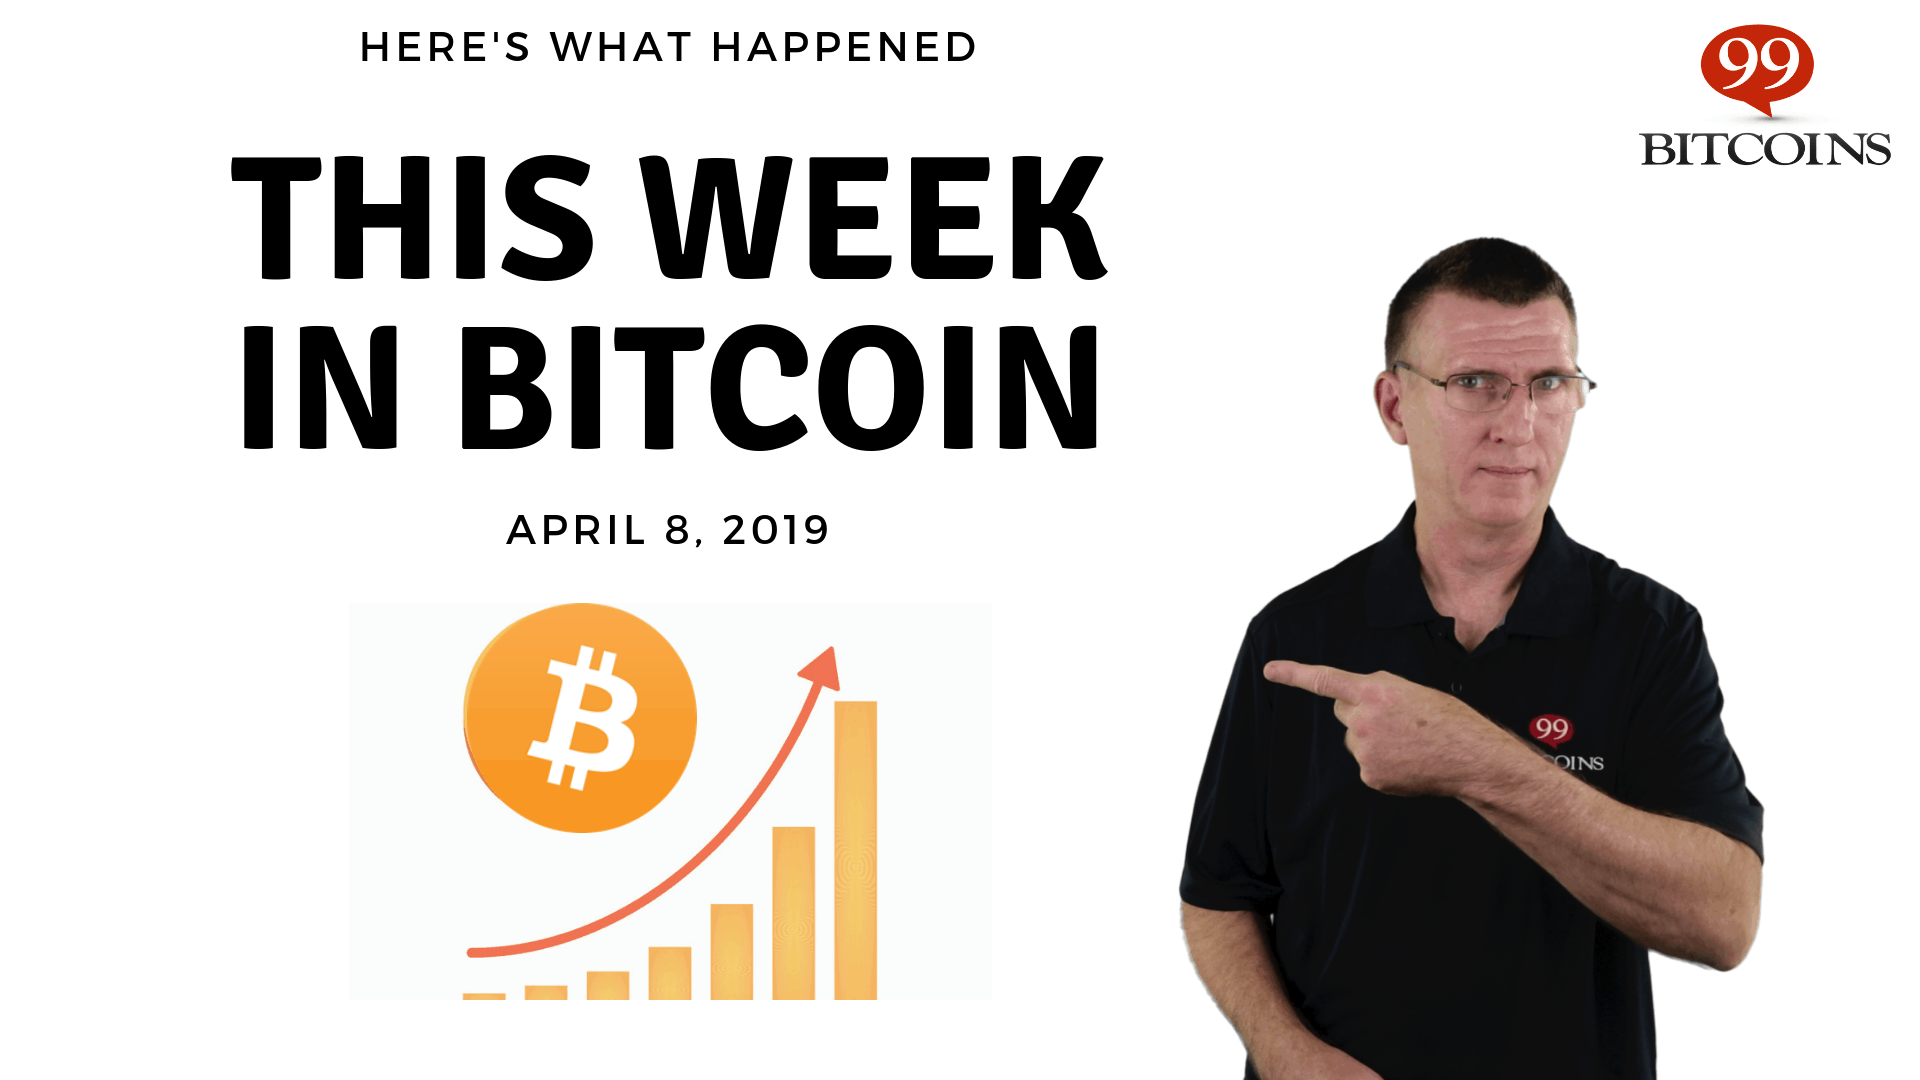 Bitcoin News Summary – April 8, 2019